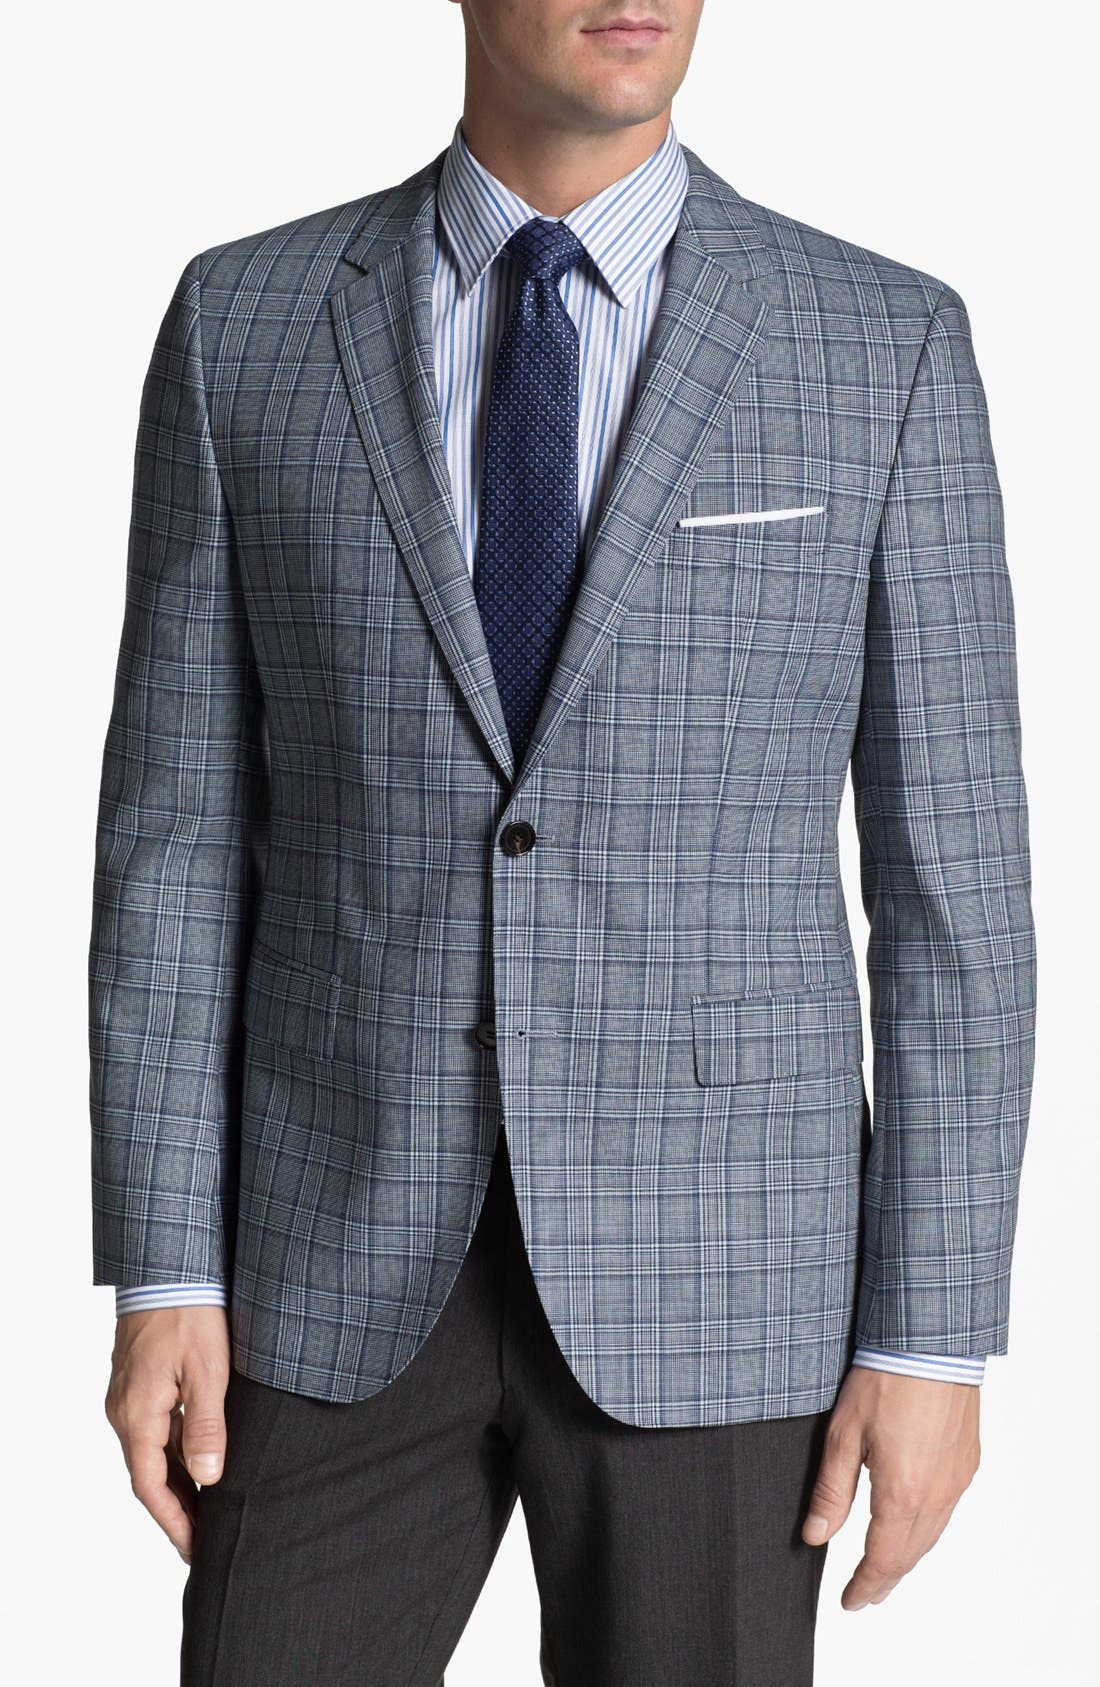 Main Image - BOSS HUGO BOSS 'James' Trim Fit Plaid Sportcoat